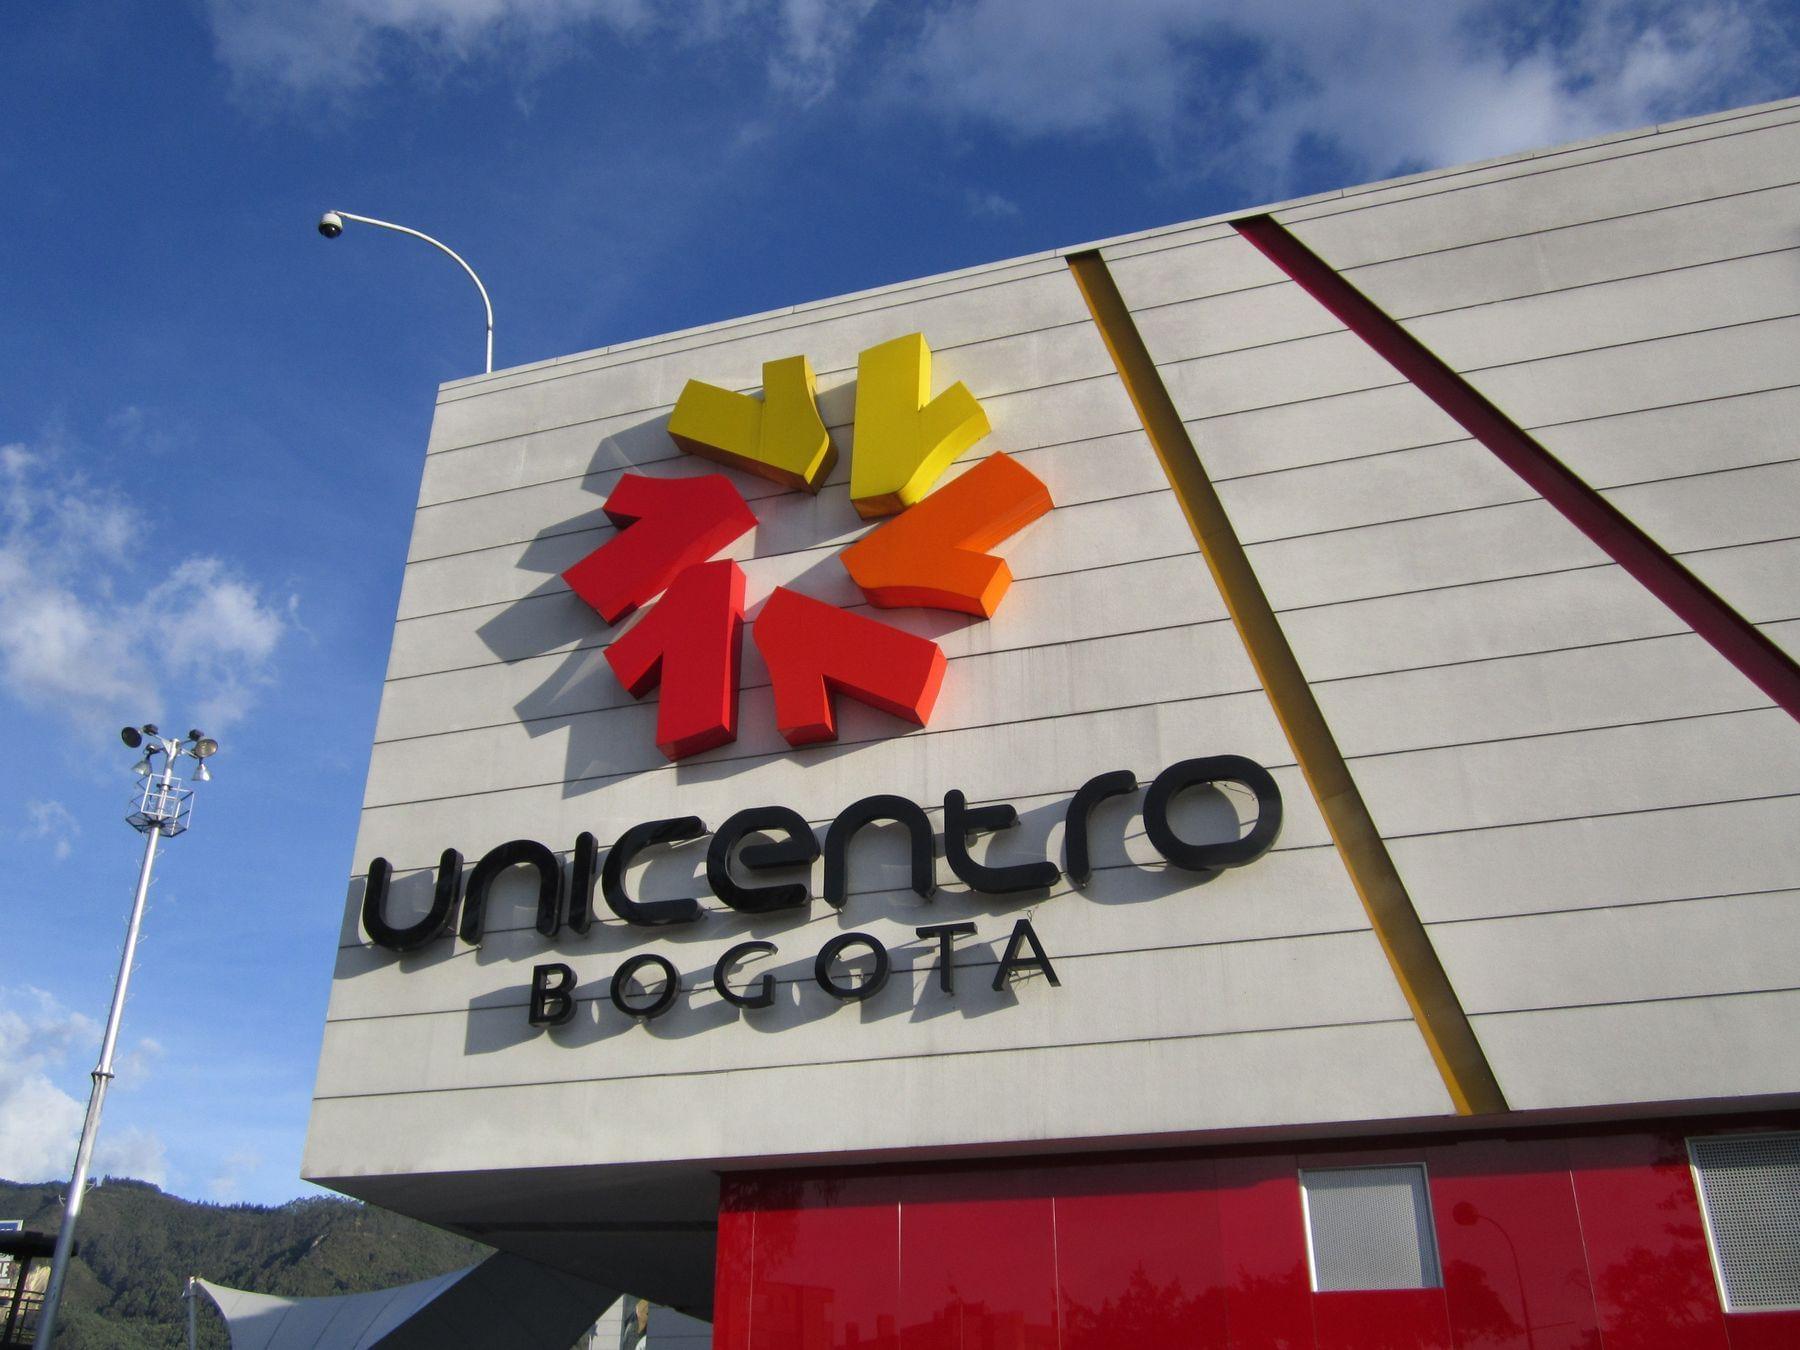 Exterior of Unicentro Bogota mall near Bogotá Plaza Hotel